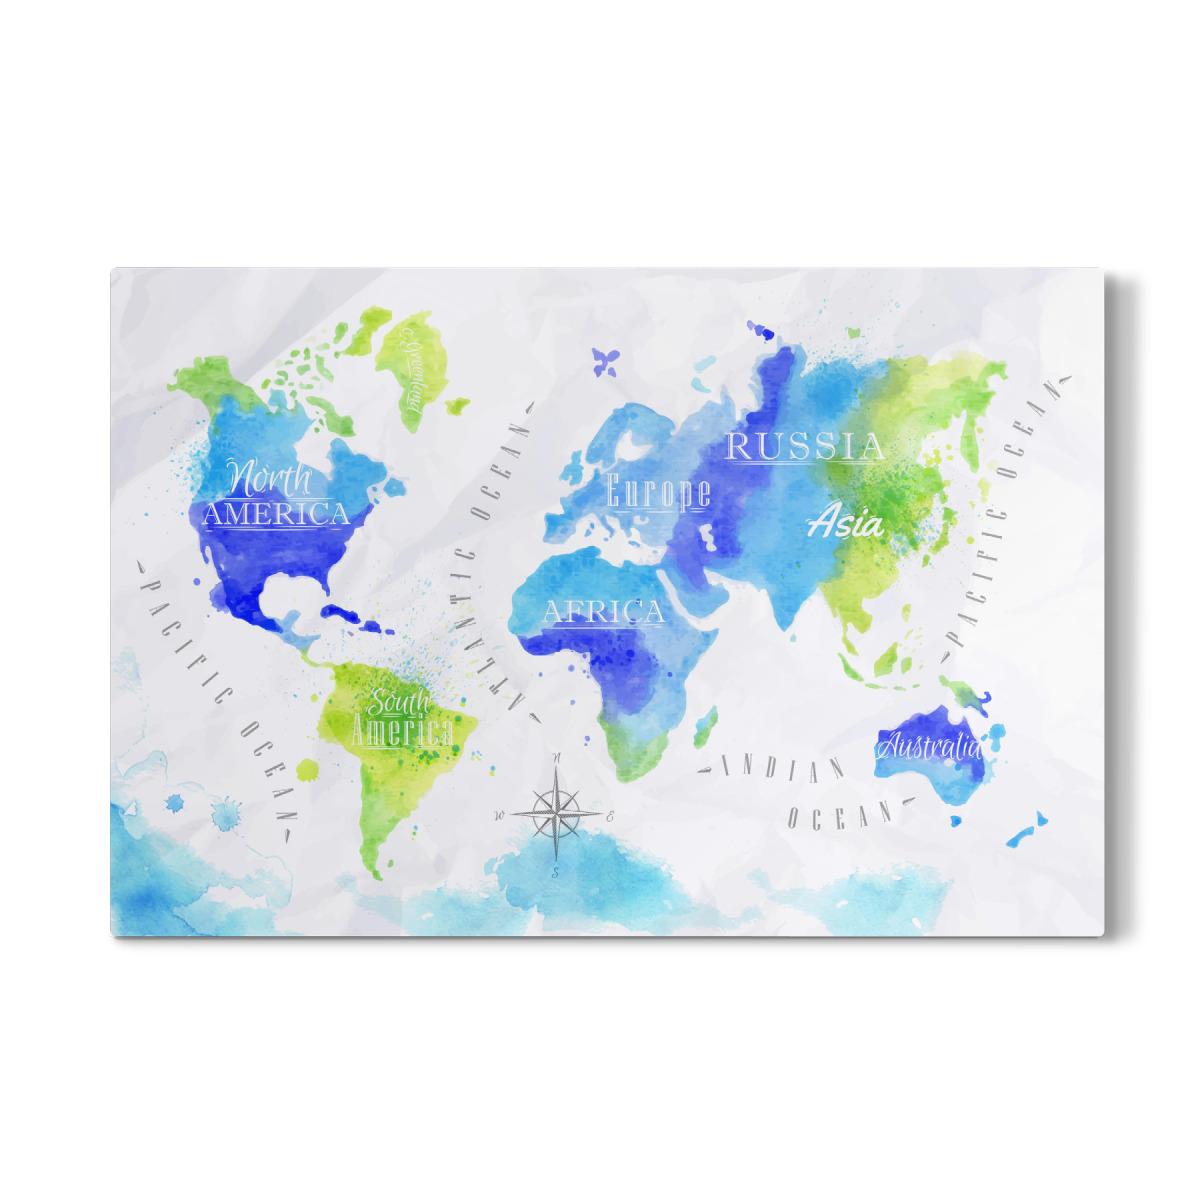 Purchase The Aquarell Weltkarte Grun Blau As A Gallery Print At